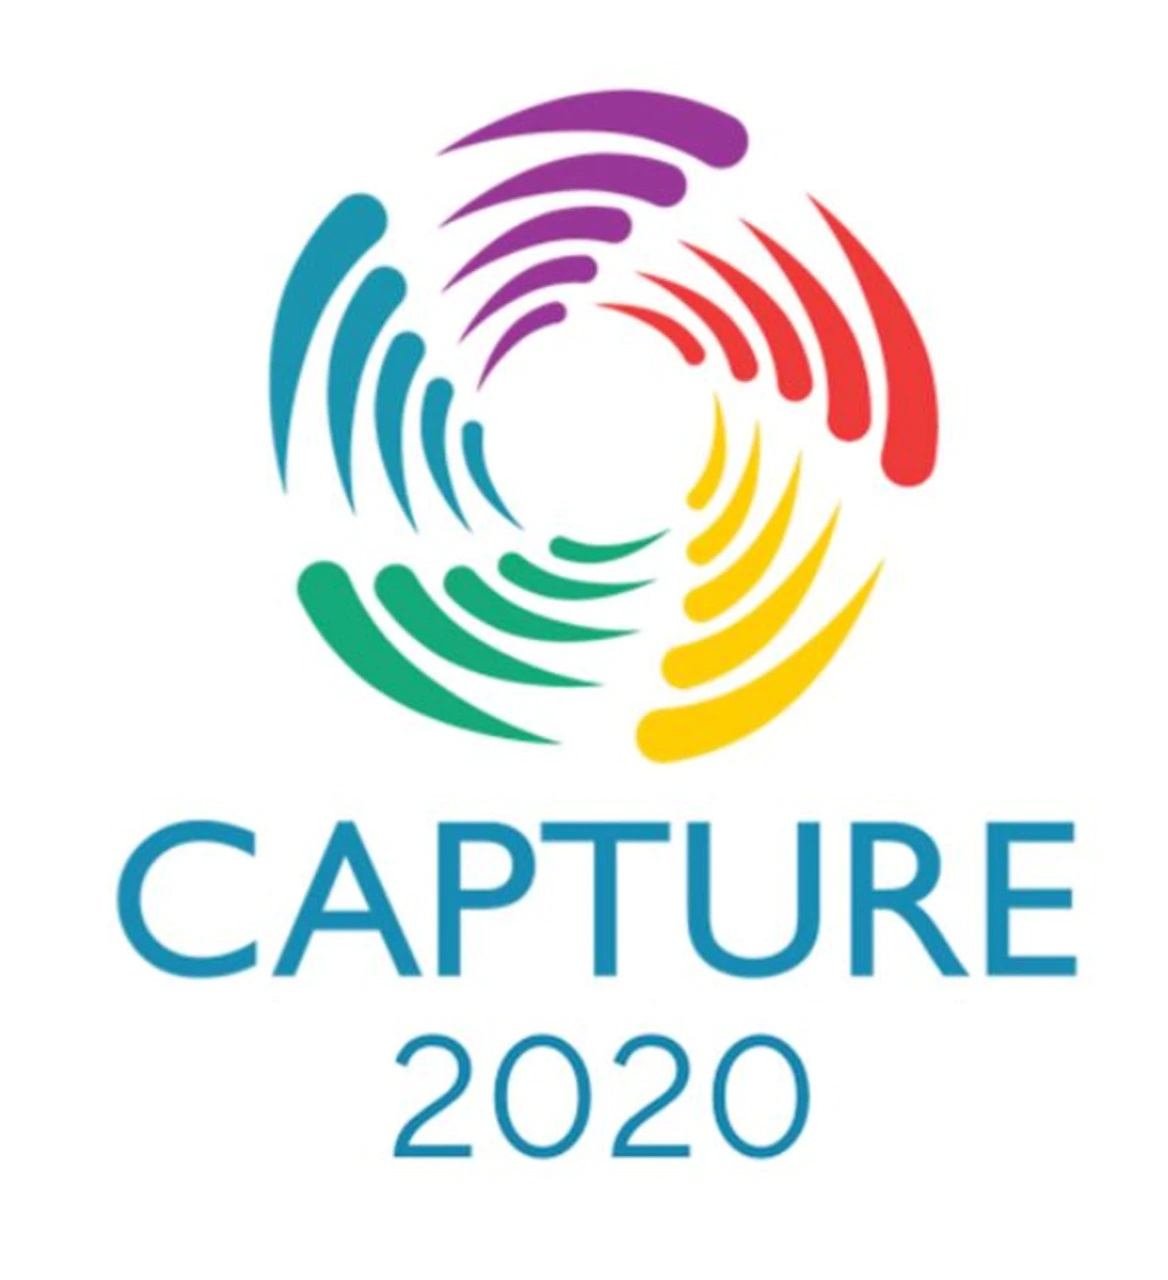 elation-capture-2020-solo-cap651.jpeg